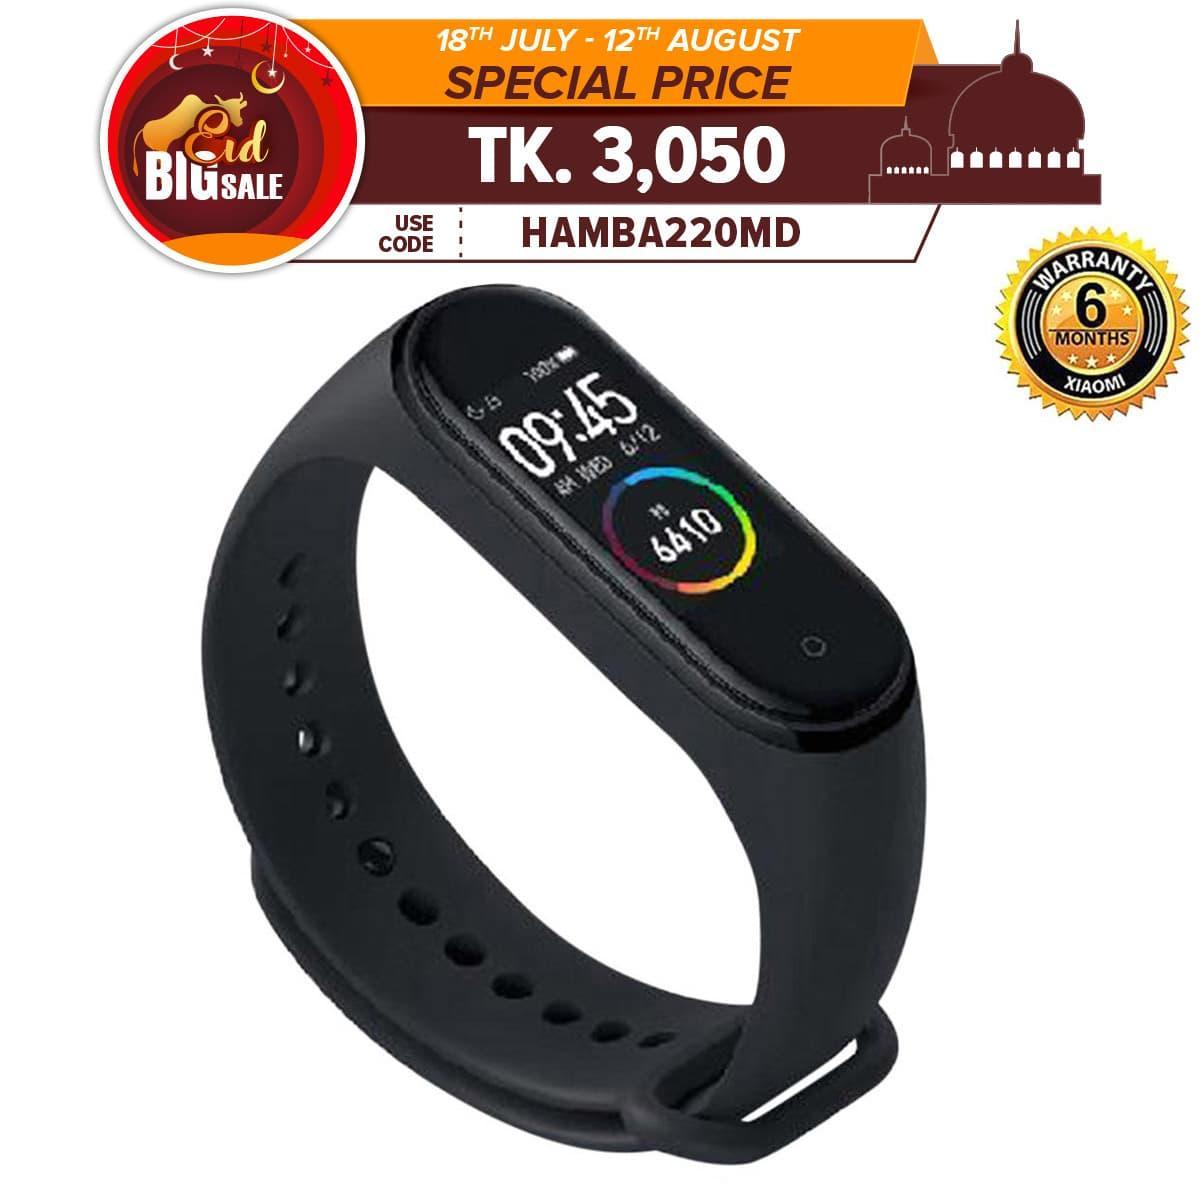 Mi Smart Band 4 Fitness Tracker Global Version - Black